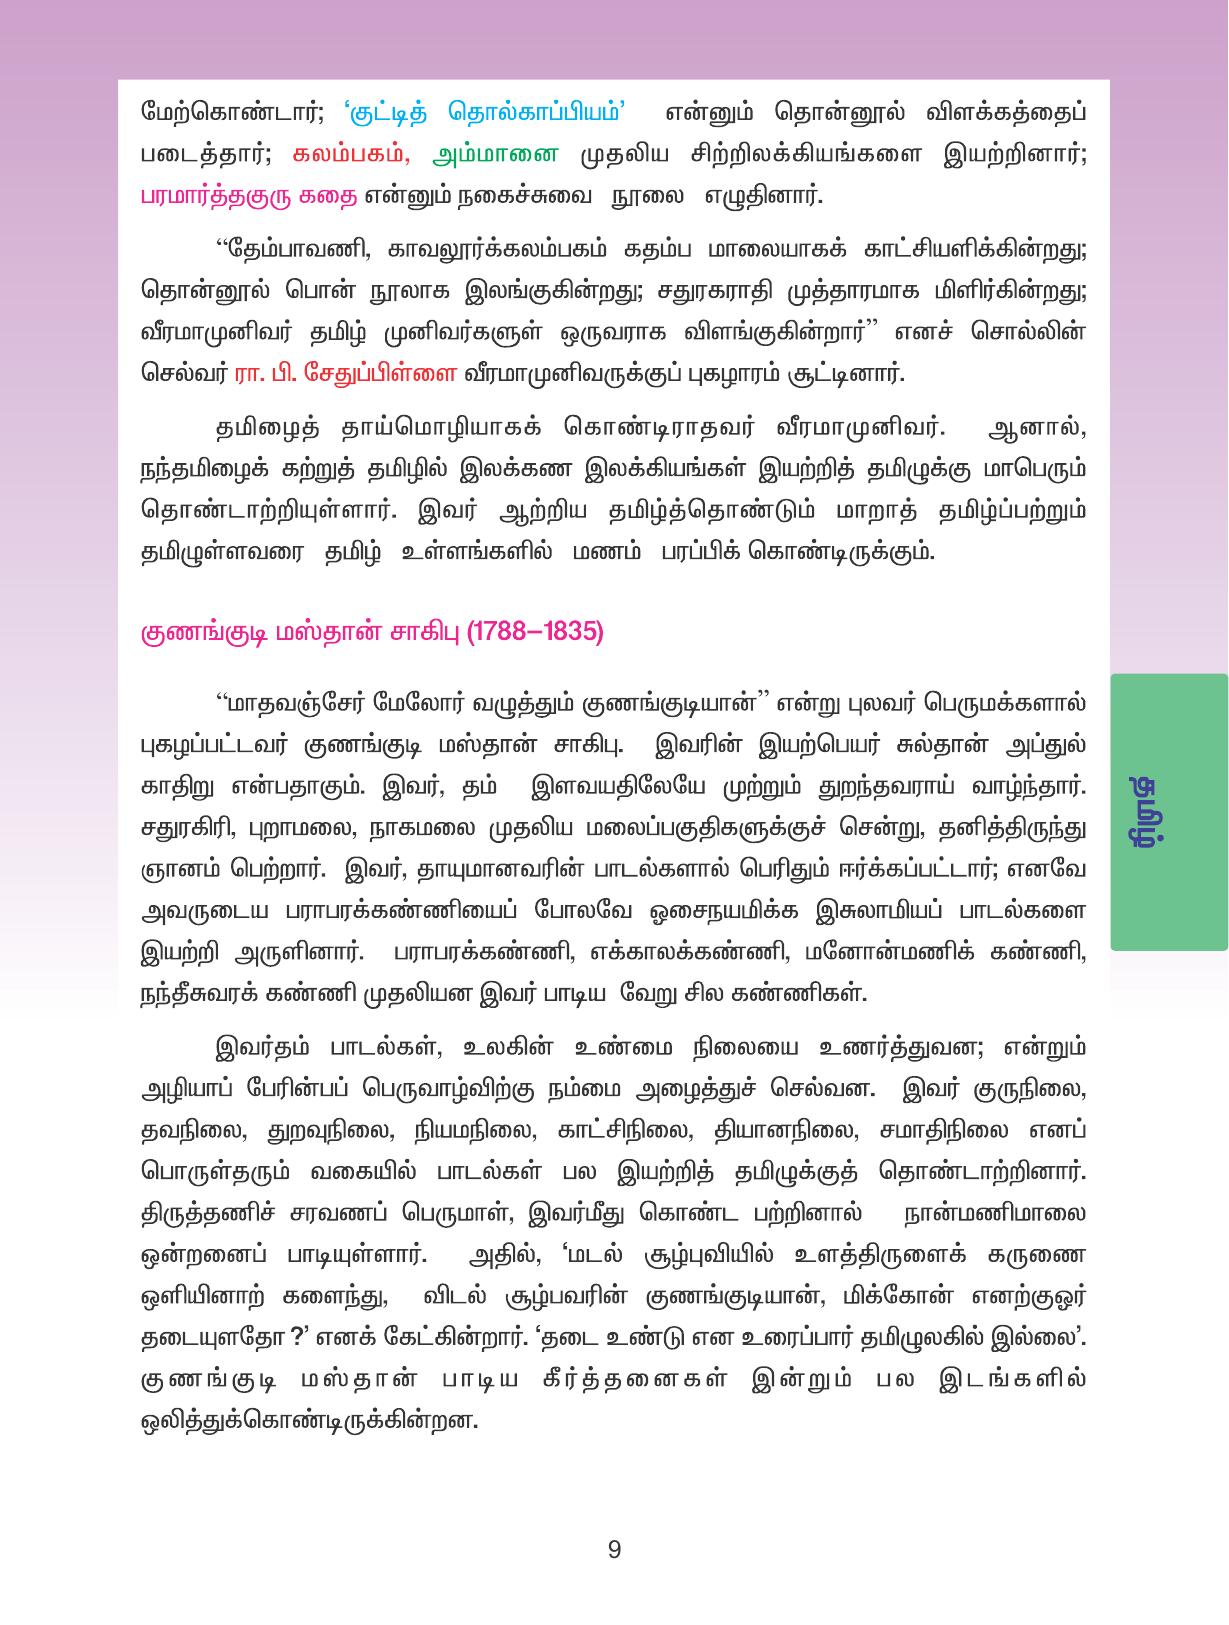 Grade Standard Class 08 Tamil Medium Text Book Page 02